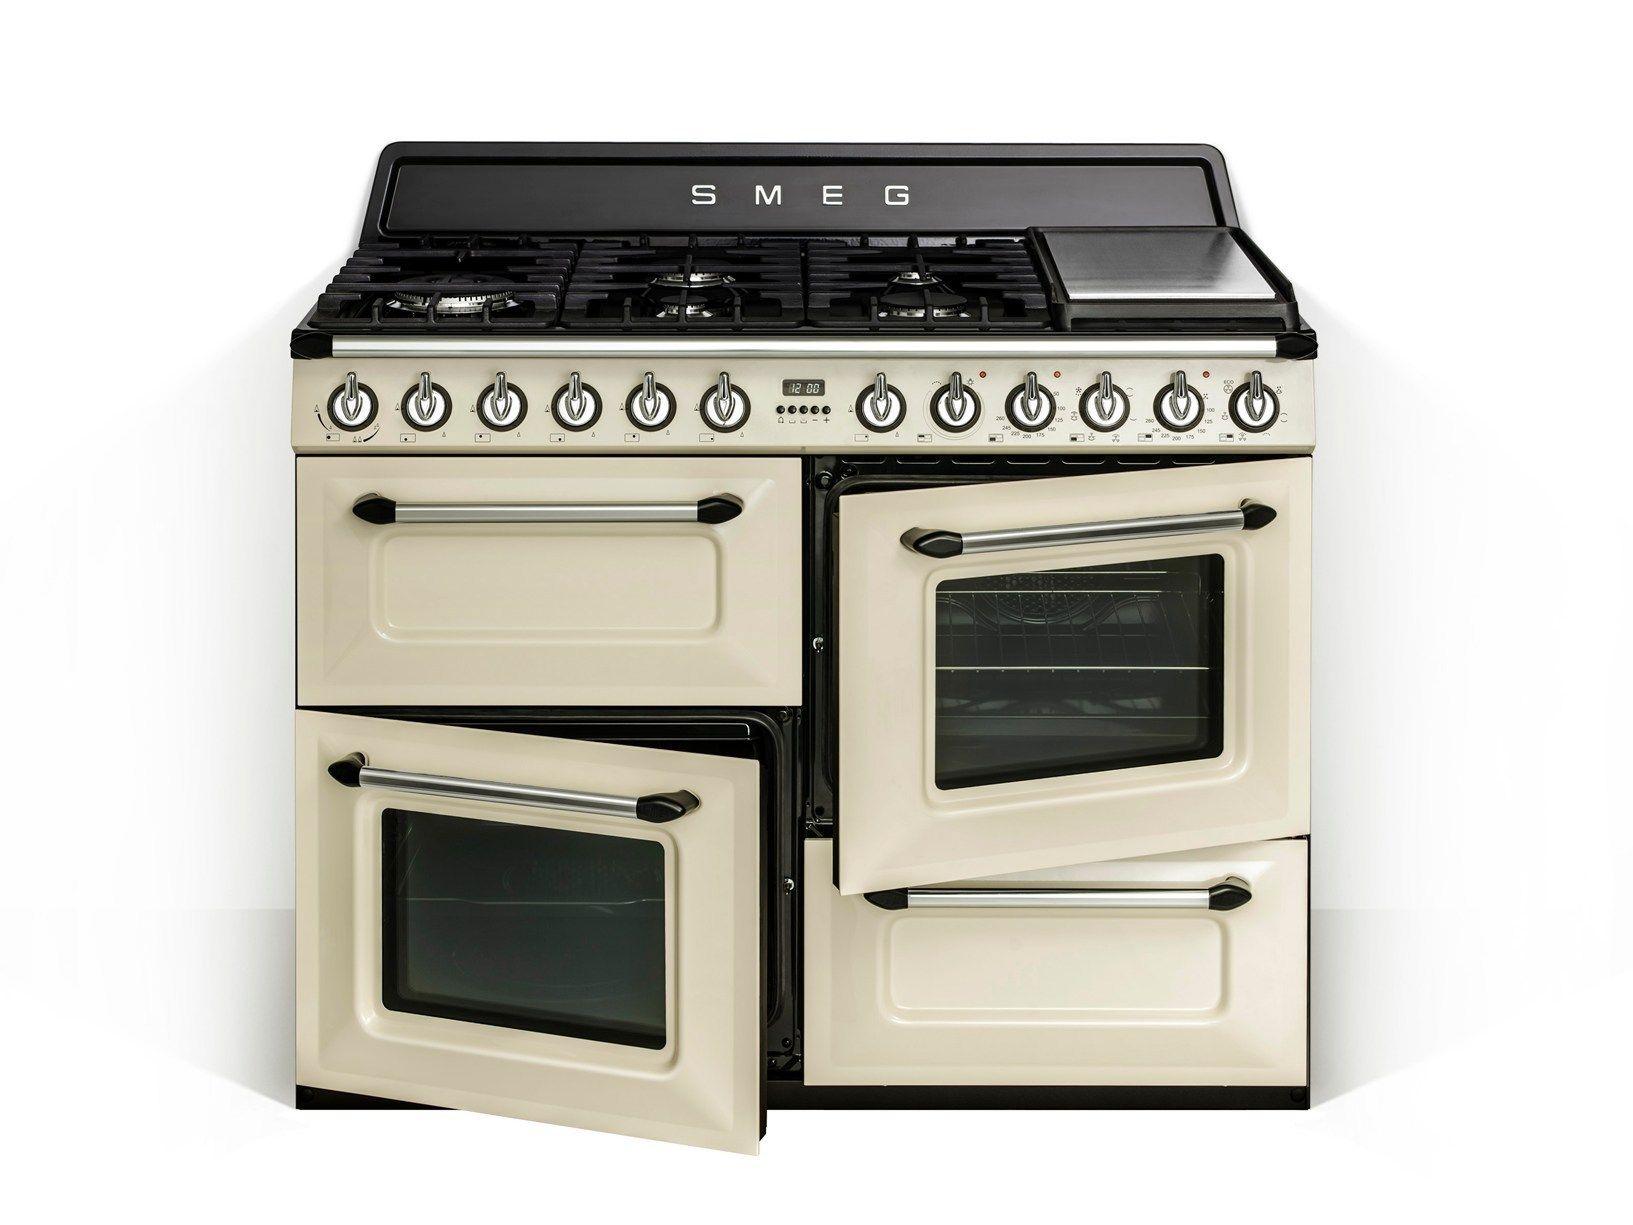 Cucine A Gas Americane : Cucine A Gas Americane : Ricerche correlate ...